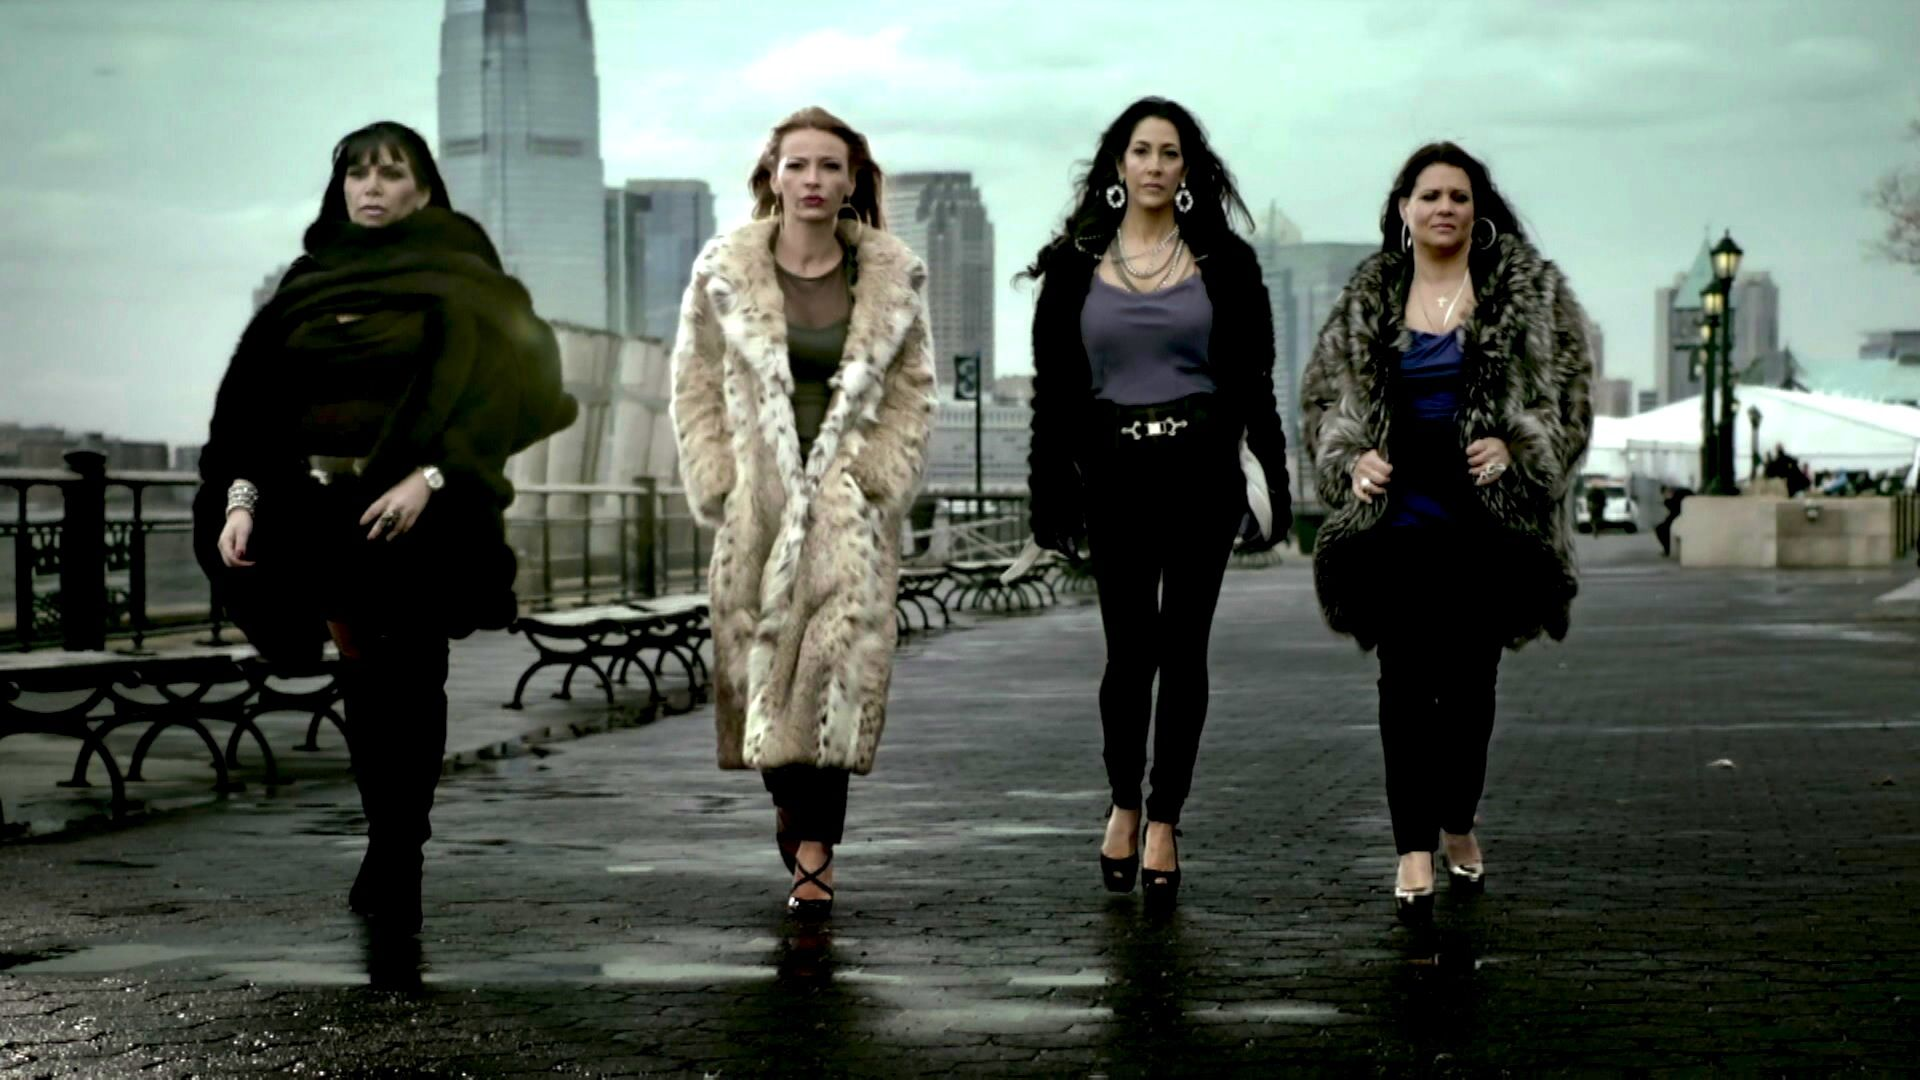 A Mo Bb Mob Wives Season 6 Episodes Tv Series Vh1